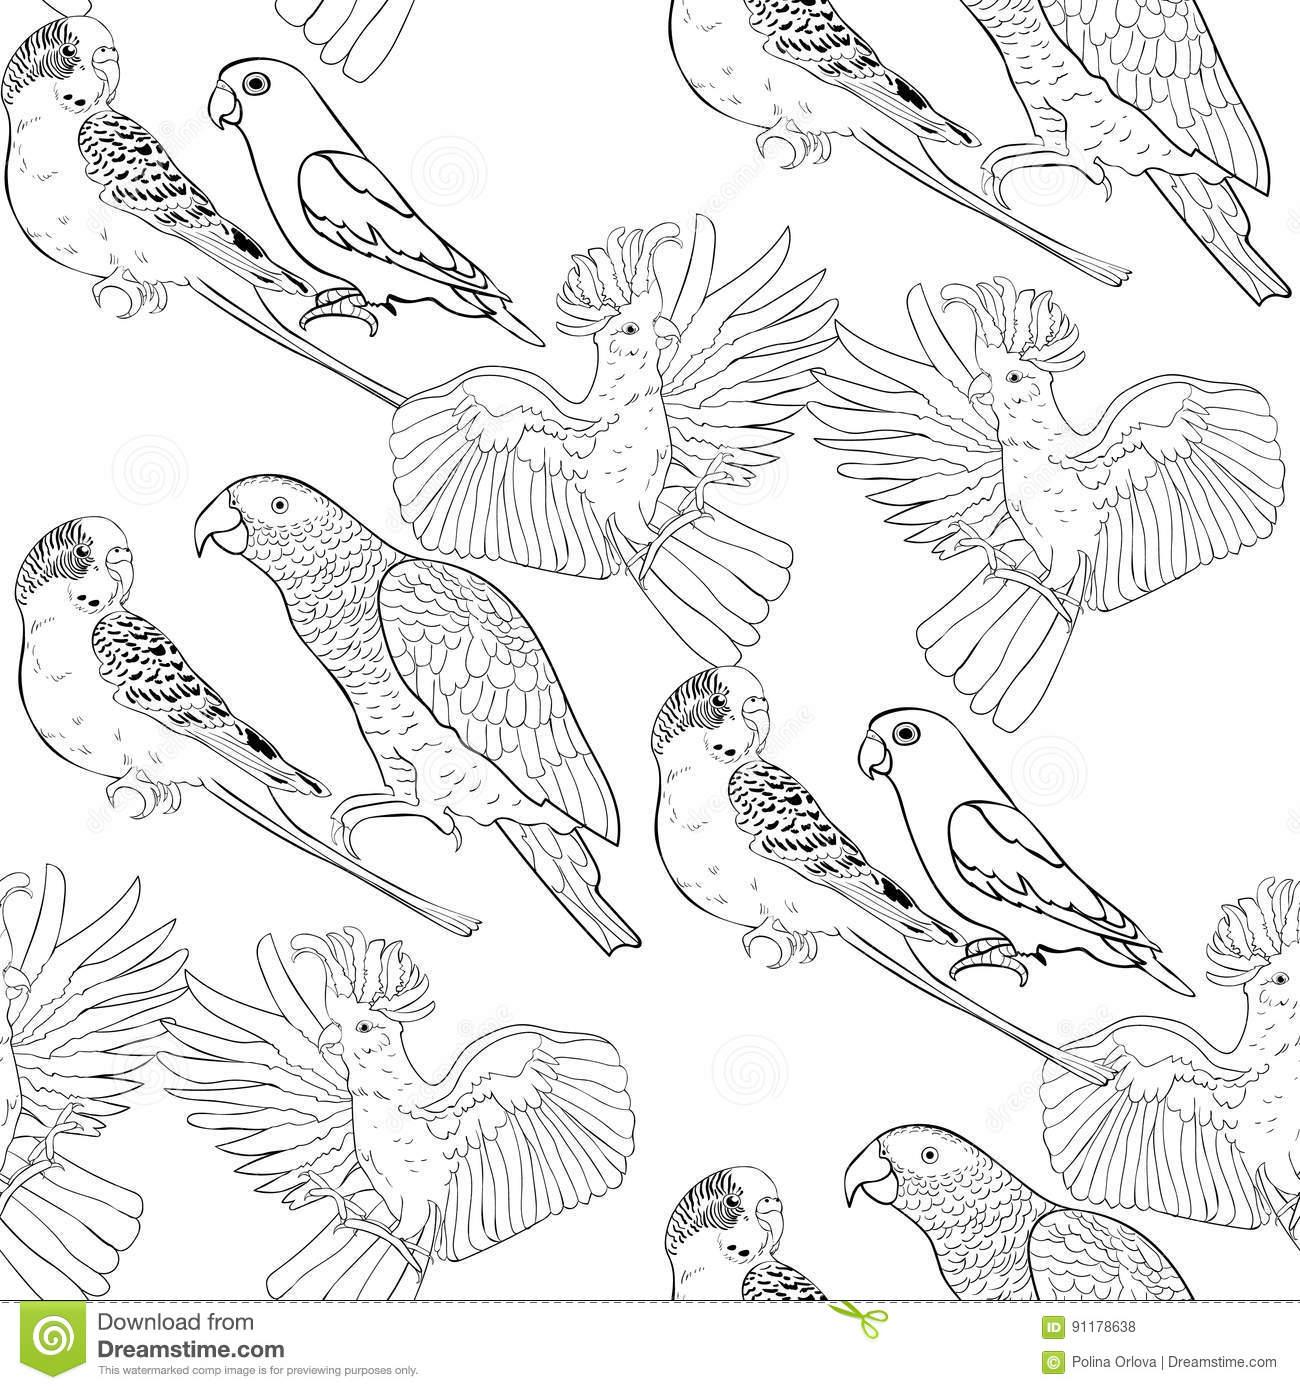 Download Kakadu coloring for free - Designlooter 2020 👨🎨